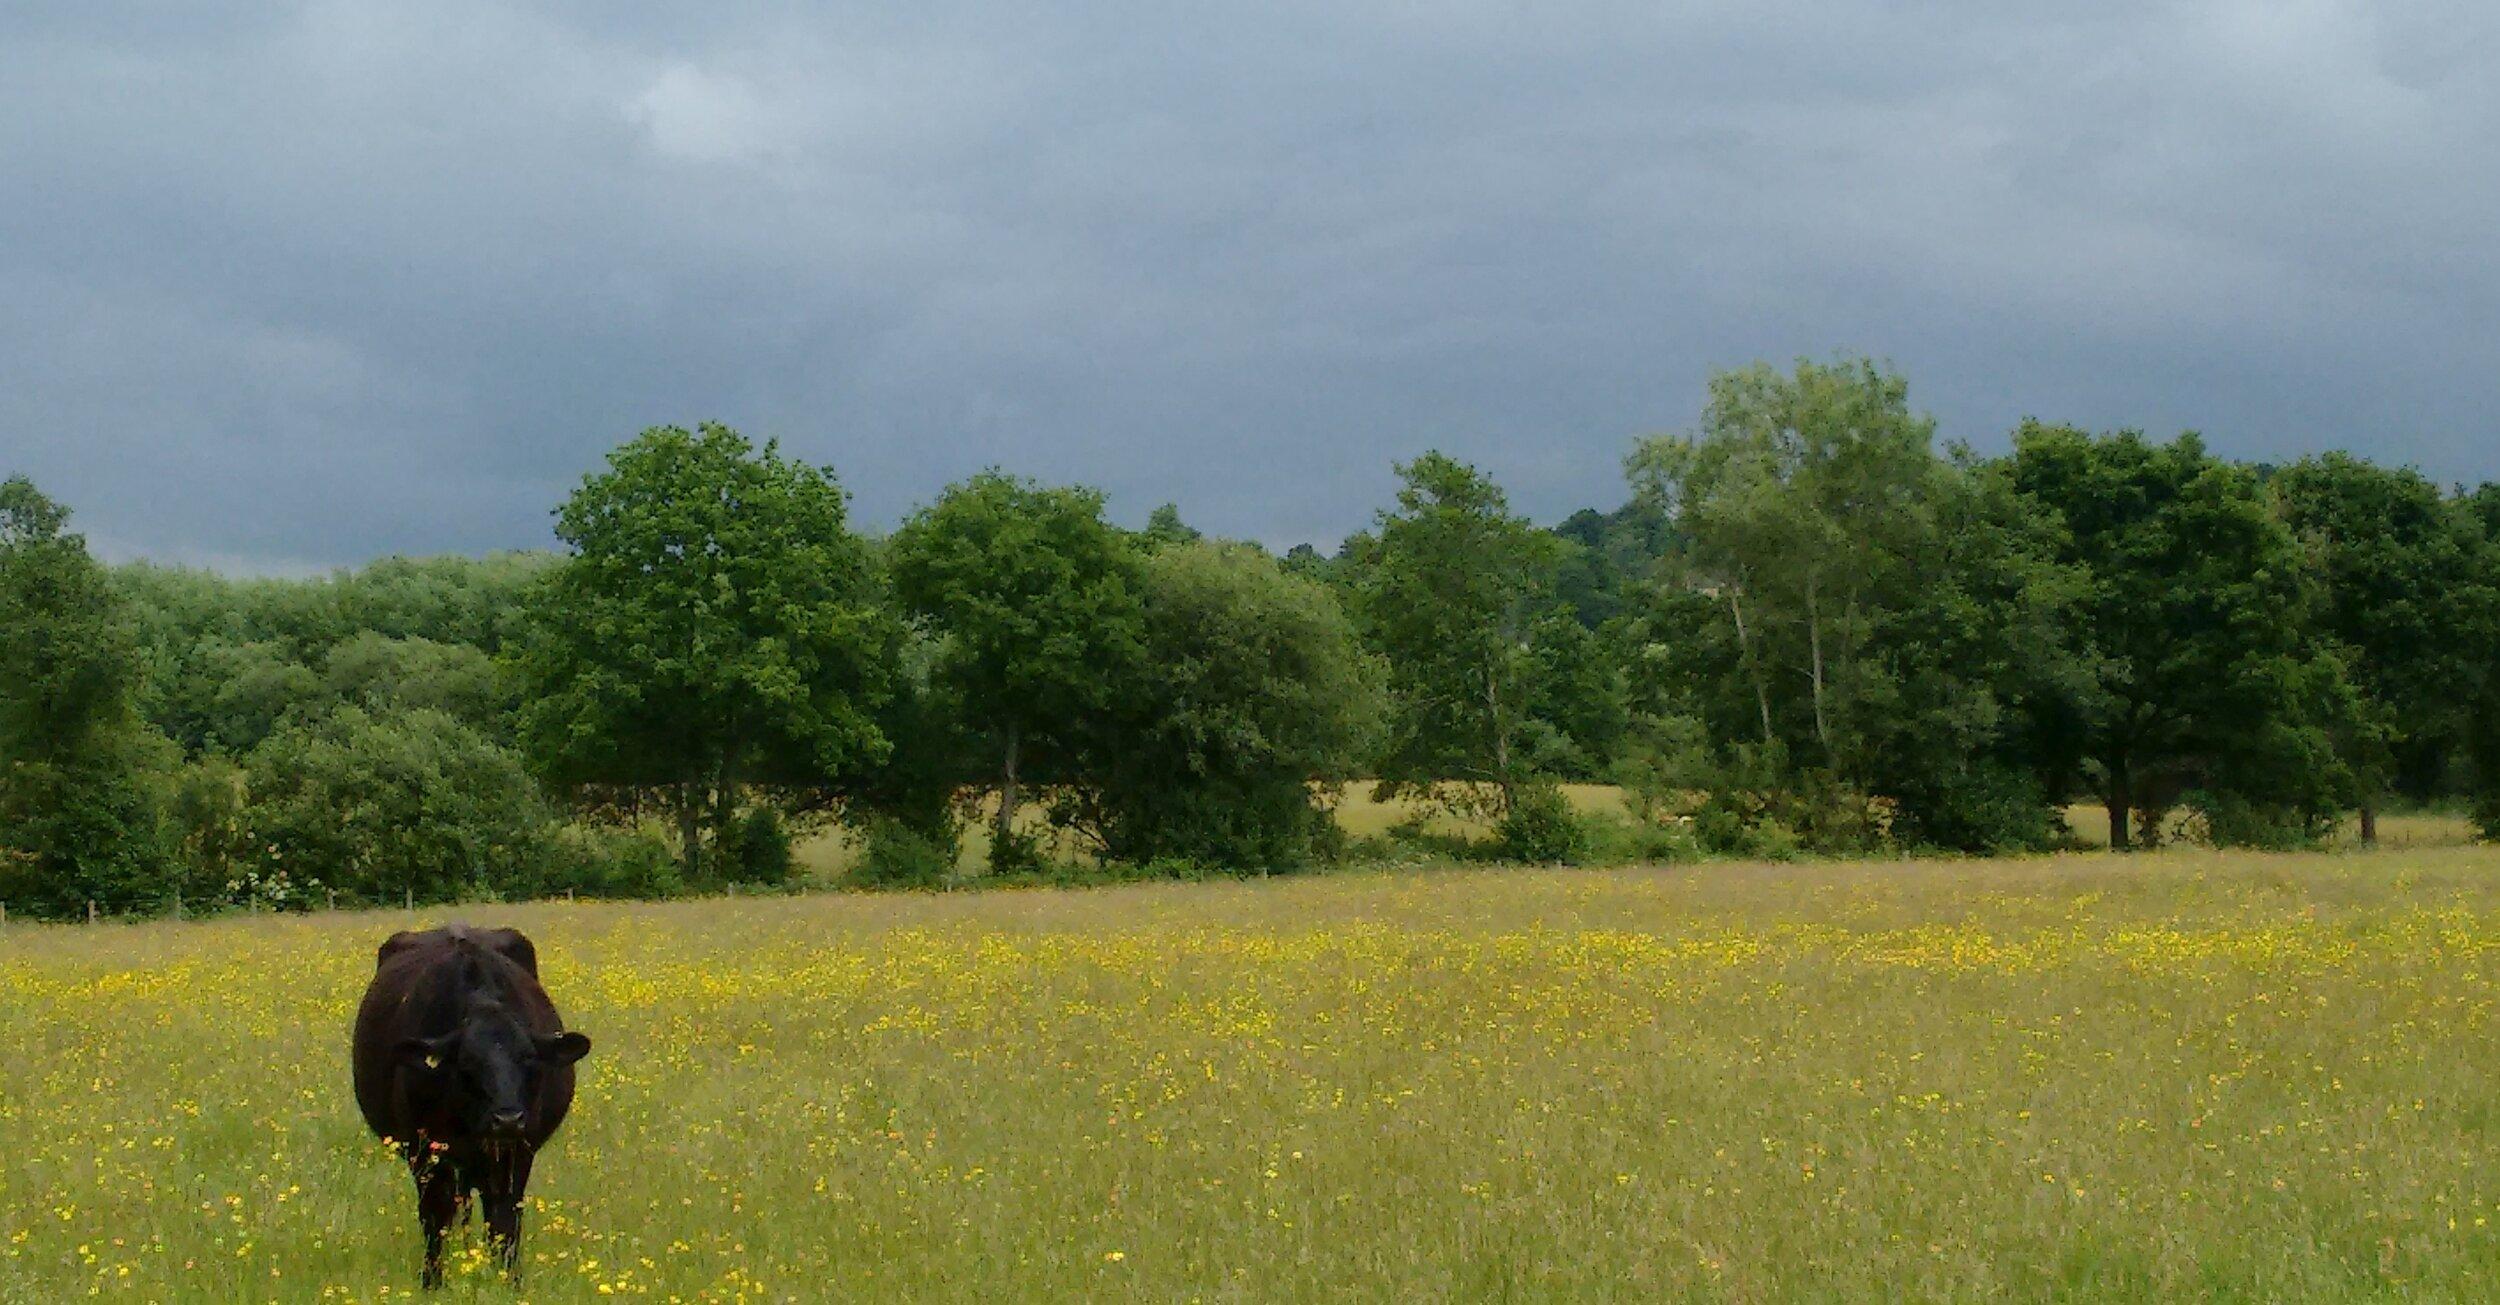 The Field of All Fields